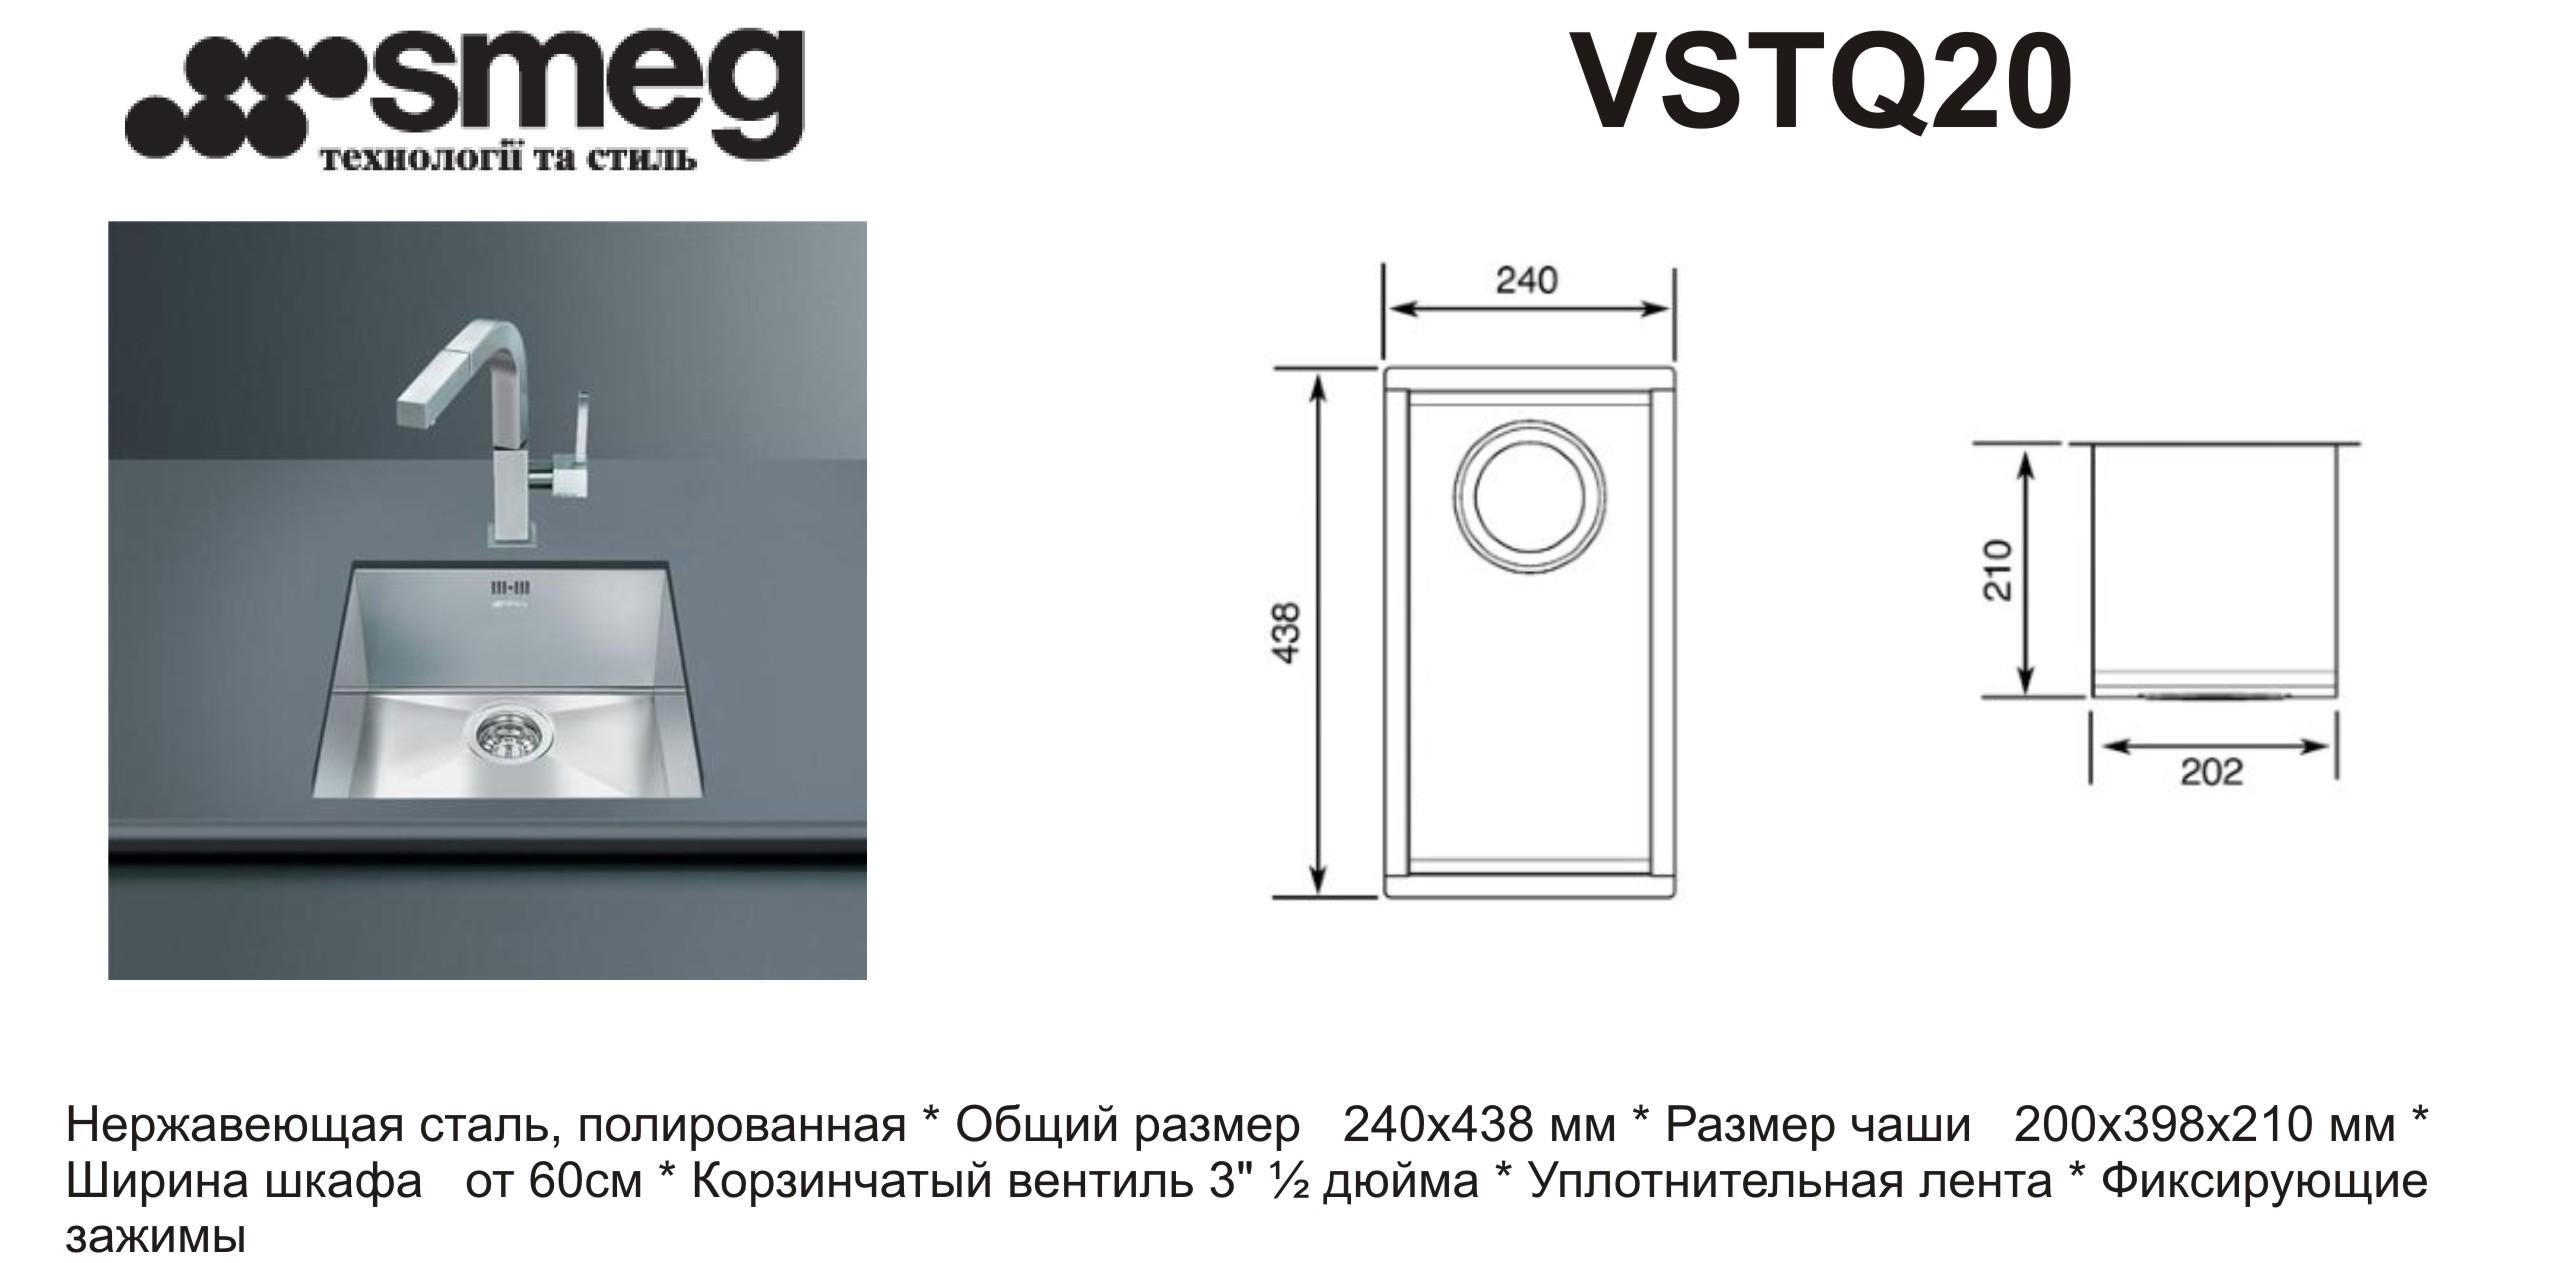 http://www.btmarket.com.ua/img_upl2/VSTQ20_1.jpg